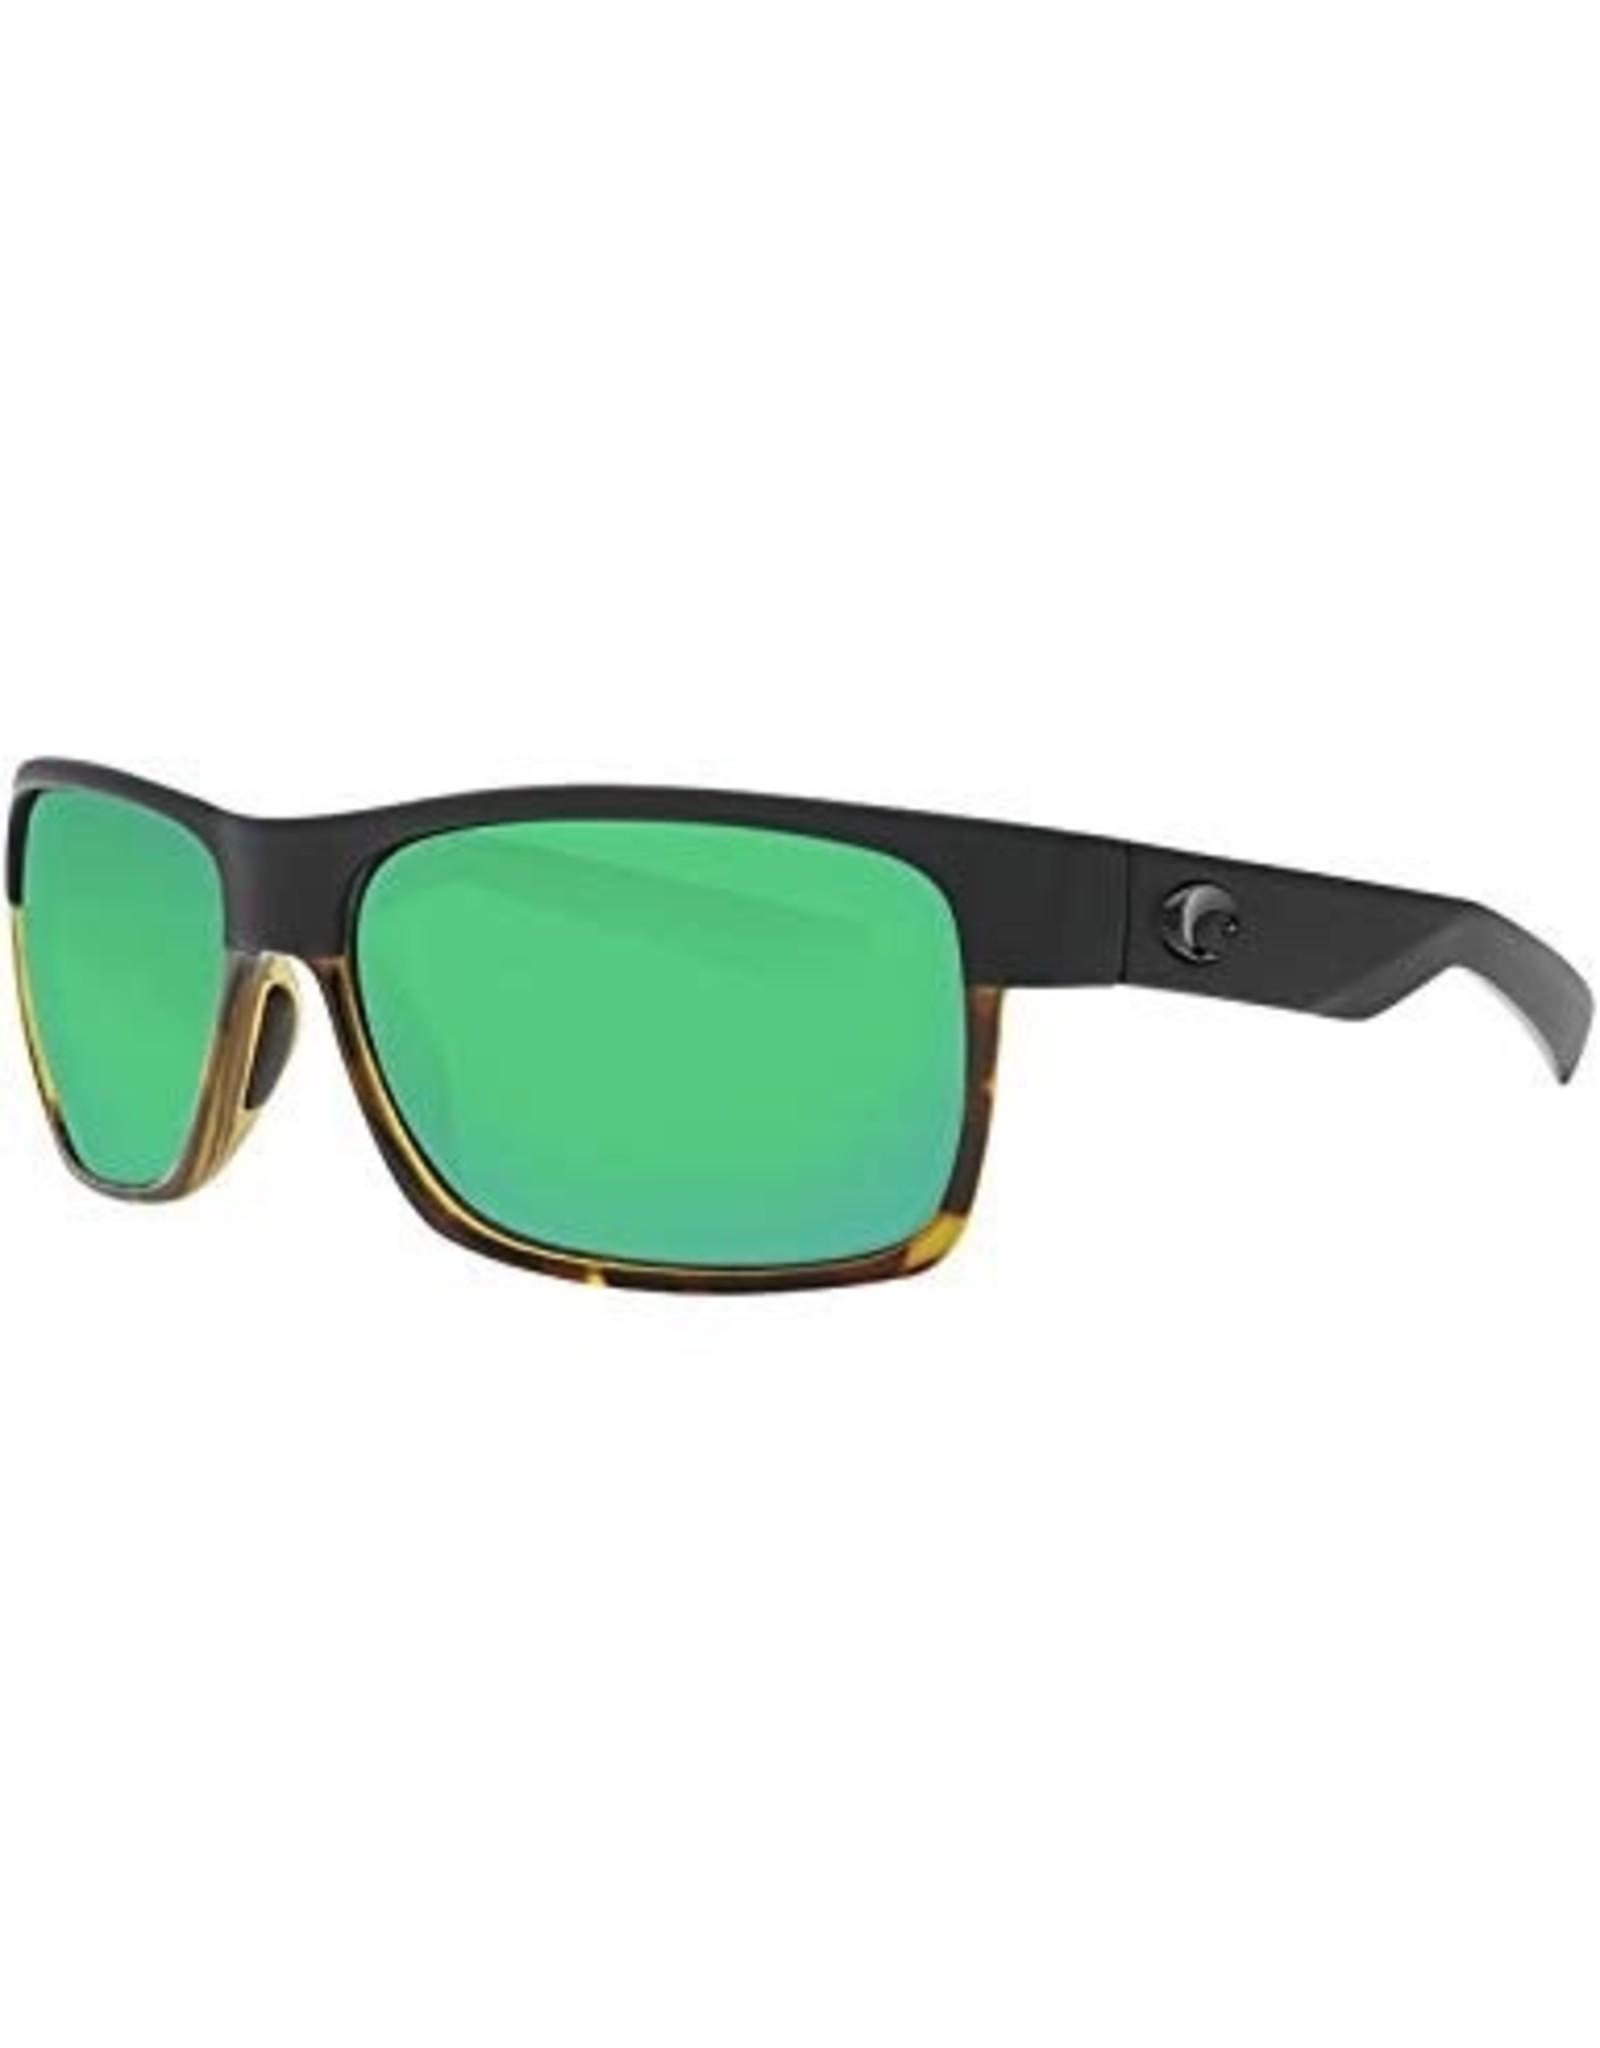 COSTA Half Moon (580P Green Mirror) Black Shiny Tortoise Frame